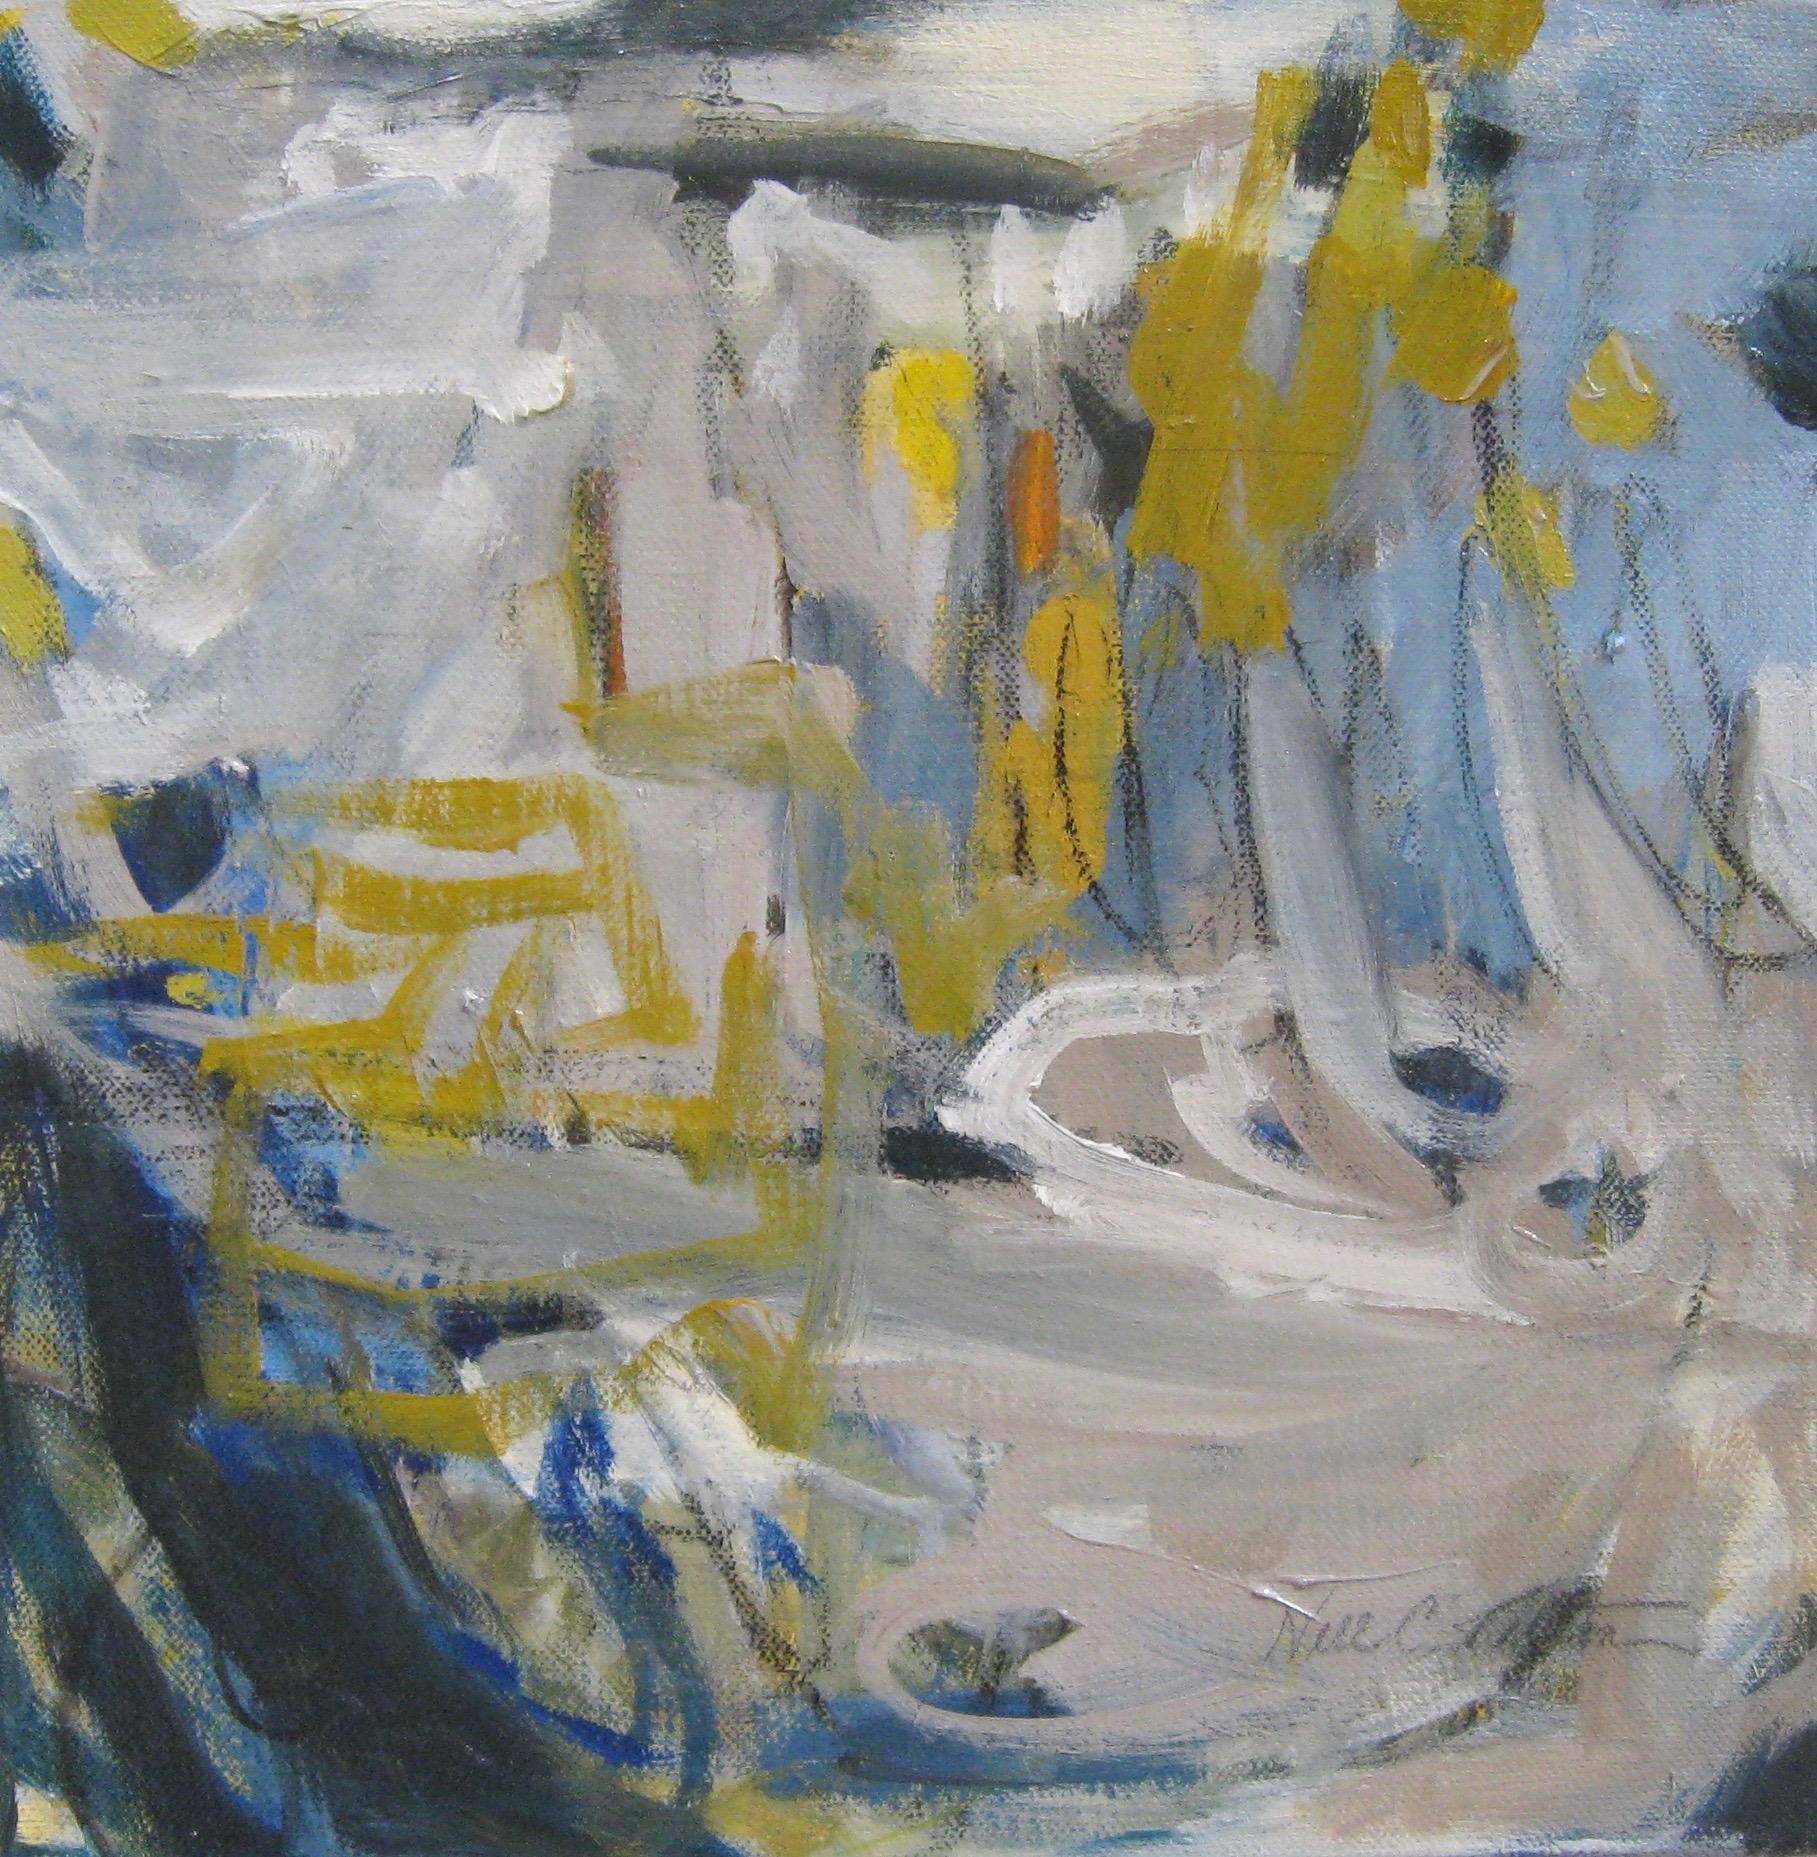 "GROOVY 12"" x 12"" Acrylic/Mixed Media on Canvas"